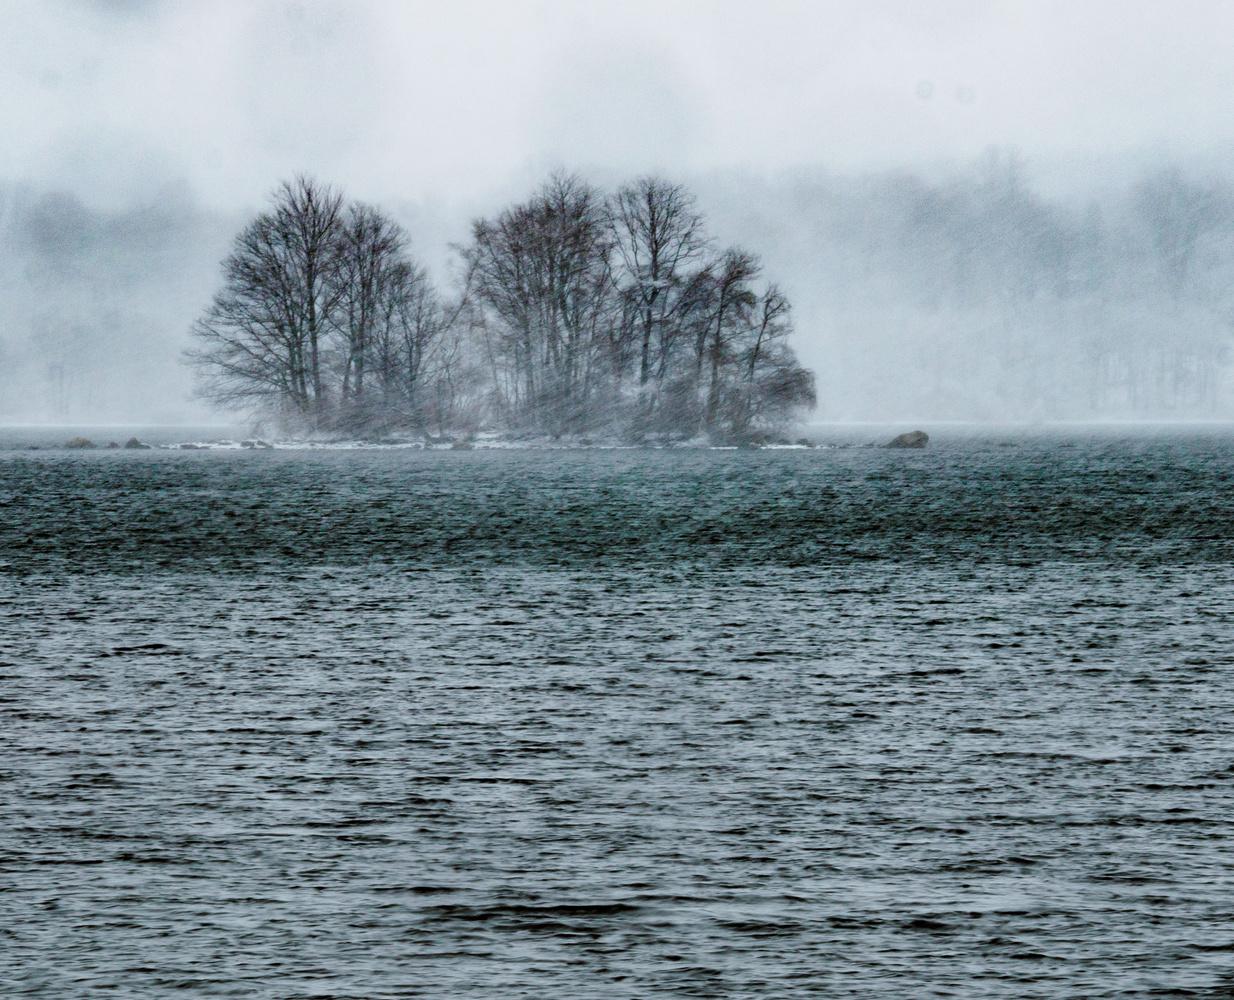 Lake Musconetcong Snowstorm by Jeff Burian